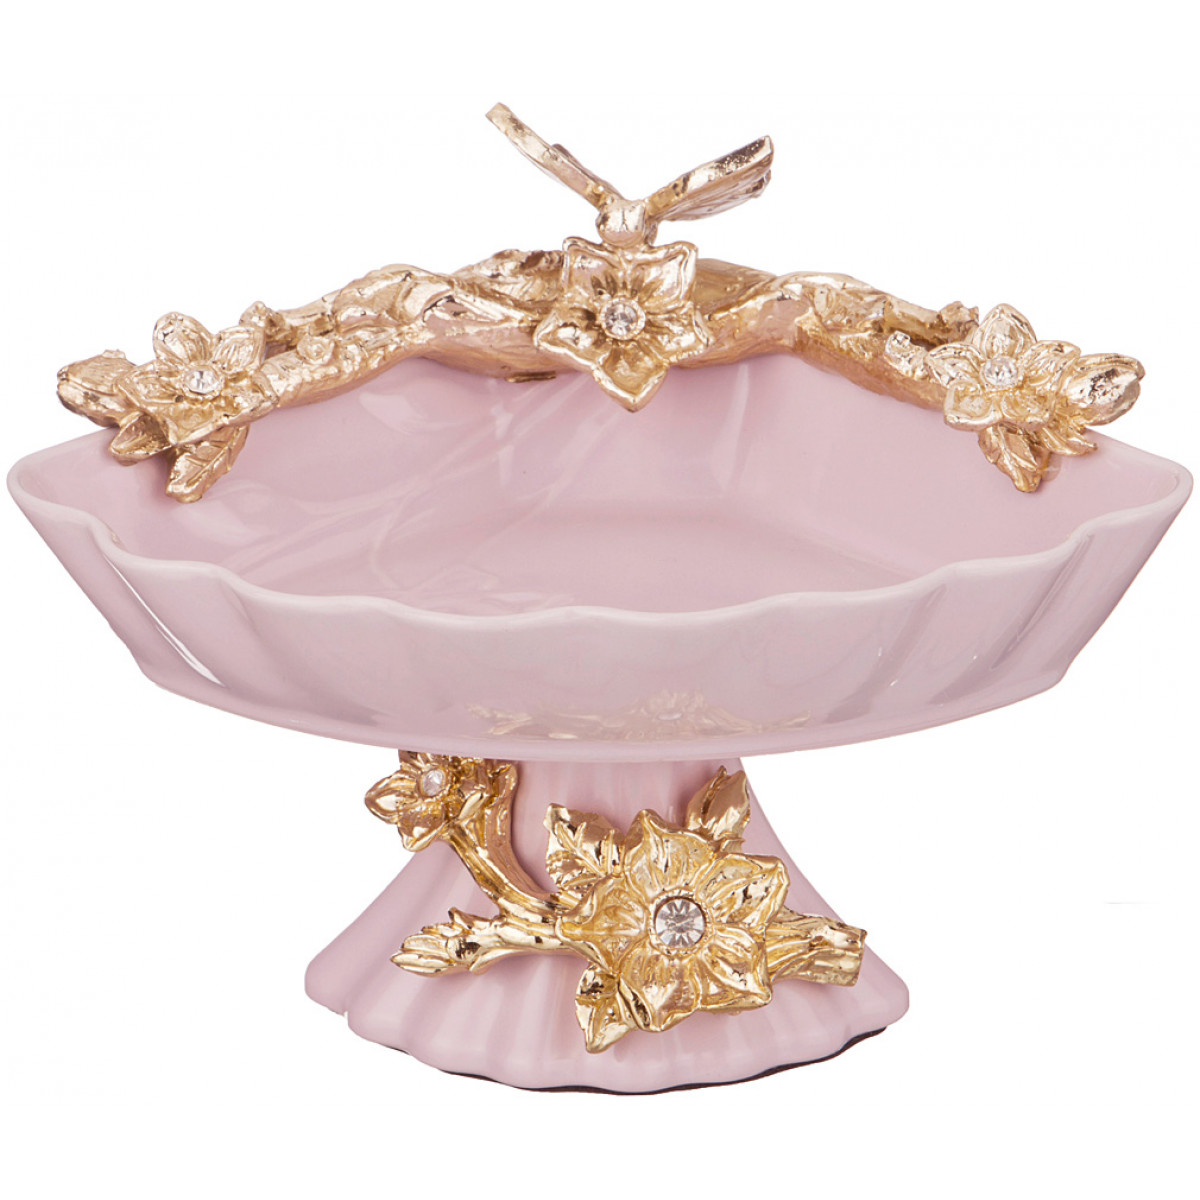 {} Arti-M Ваза Bienno  (18х20х24 см) ваза керамика розовый рассвет 18 12 8 5 см 863622